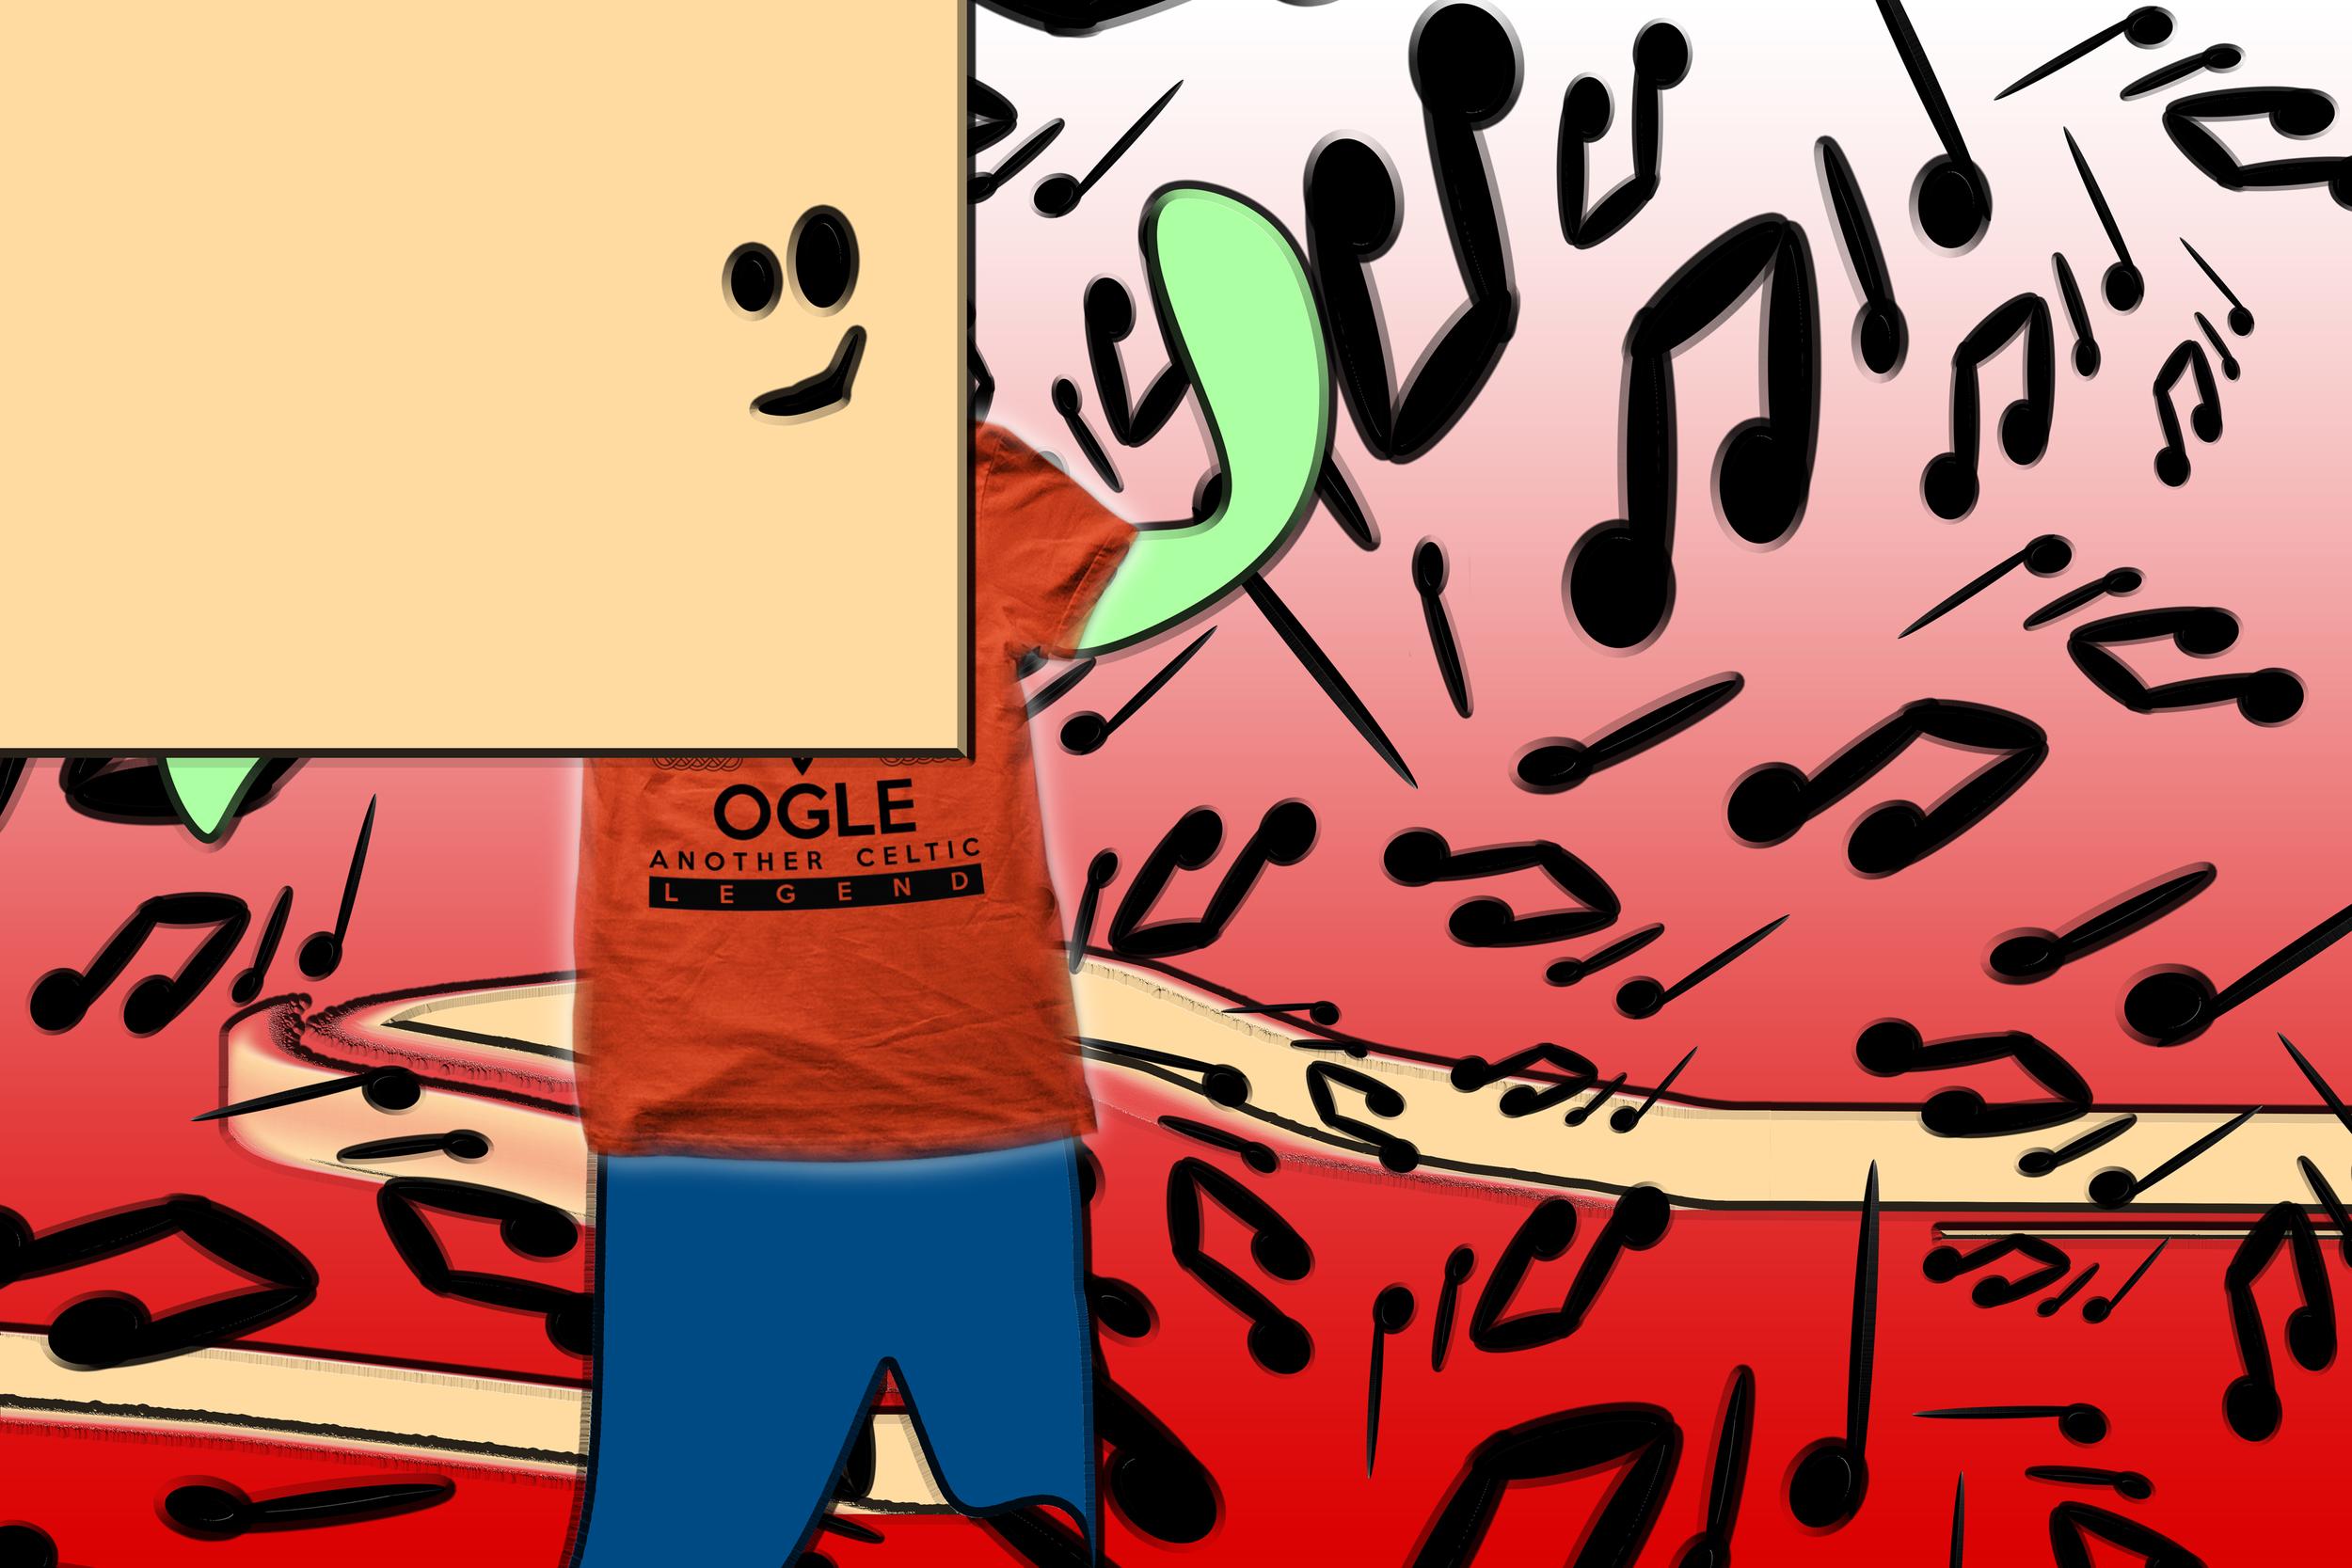 OgleBlockHead.jpg